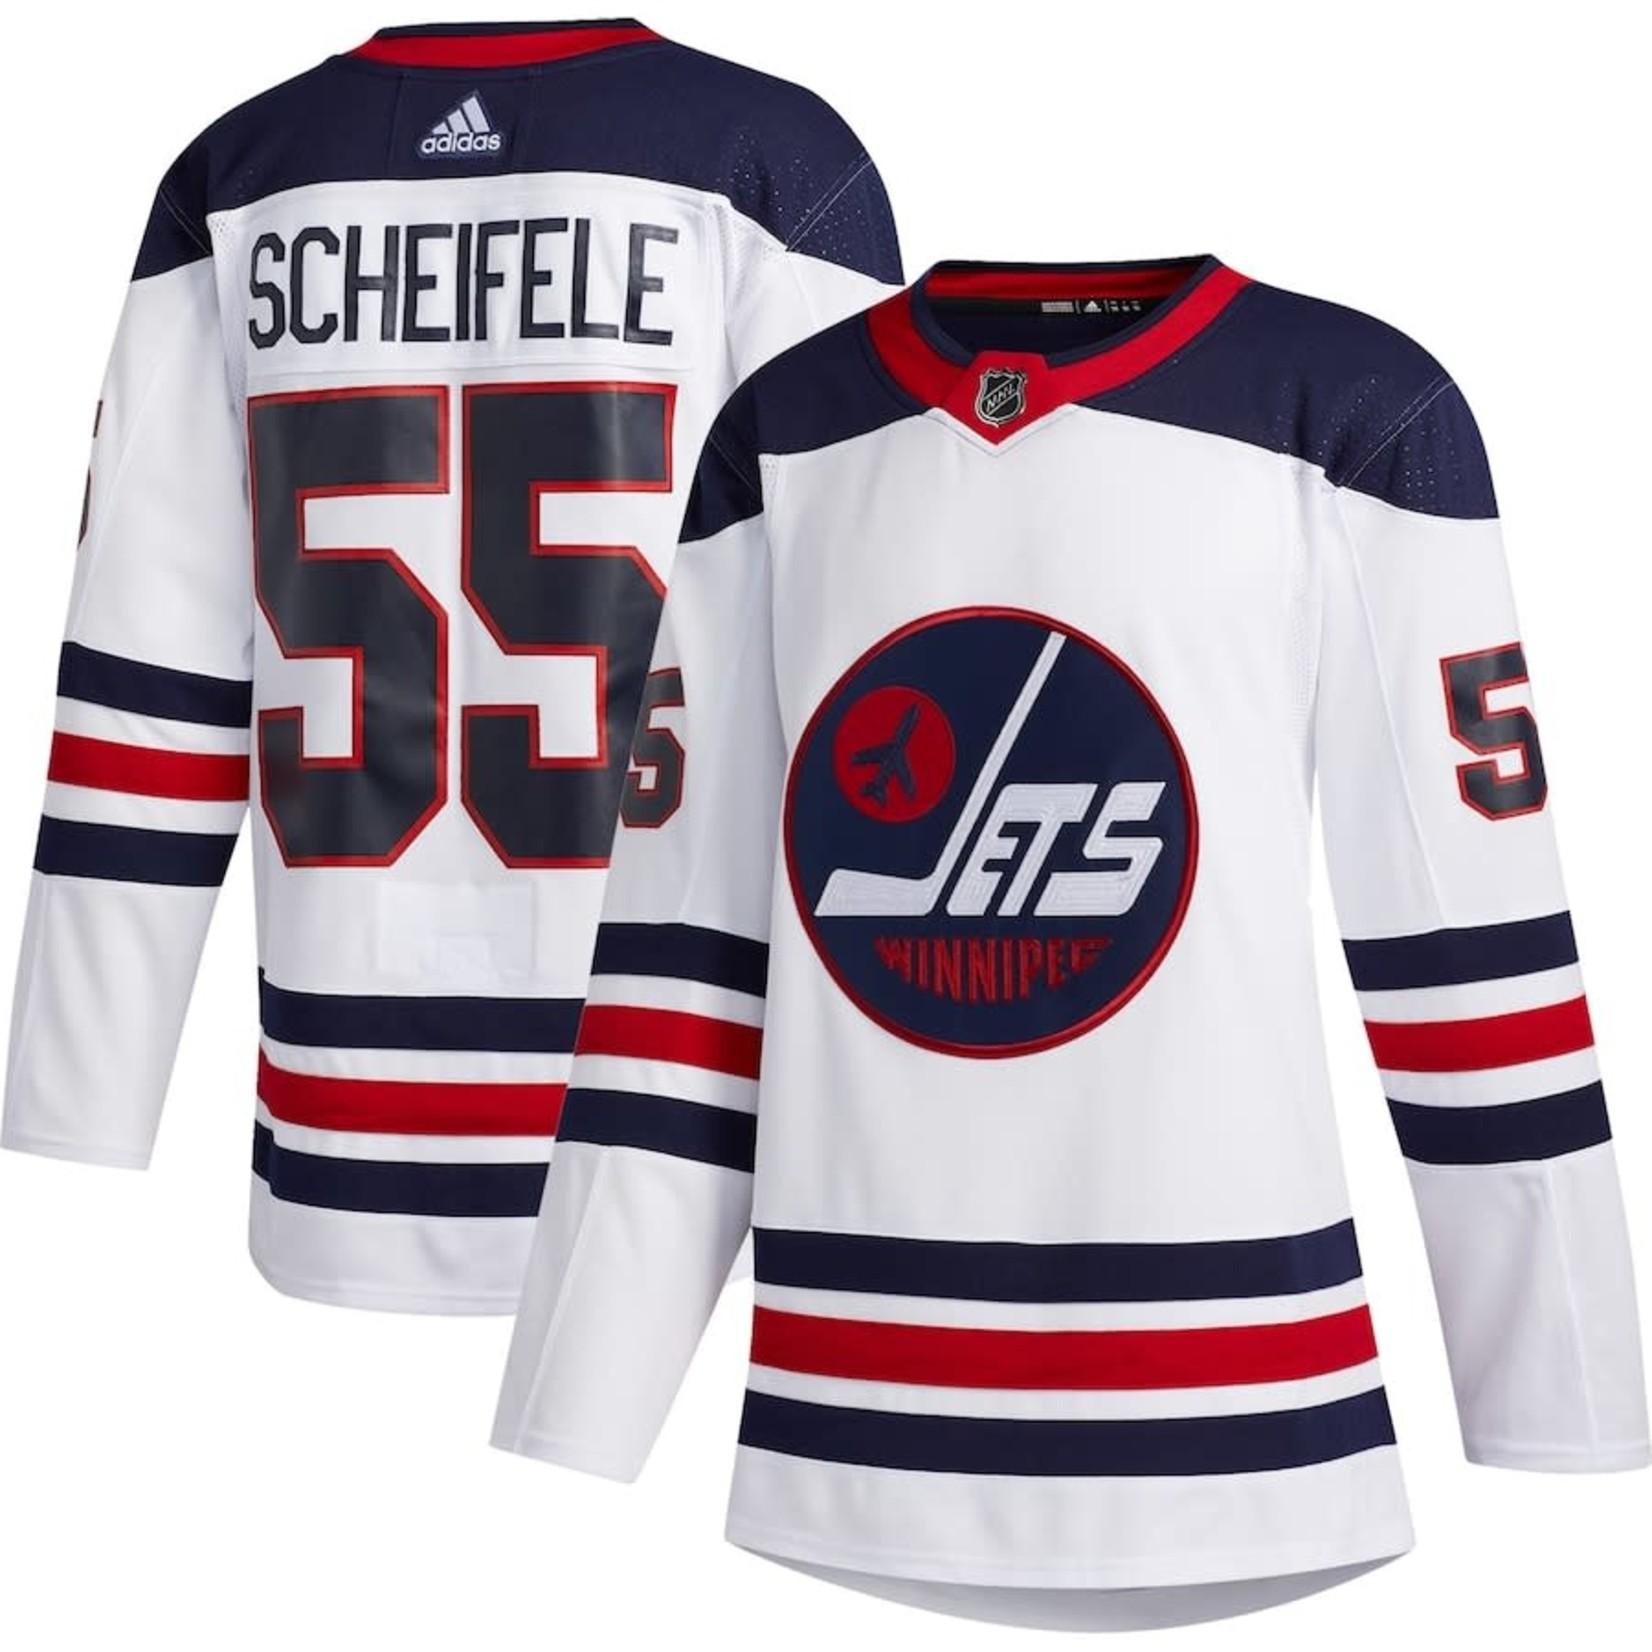 Adidas Adidas Hockey Jersey, Authentic, Mens, NHL, Winnipeg Jets, Heritage Wht, Mark Scheifele